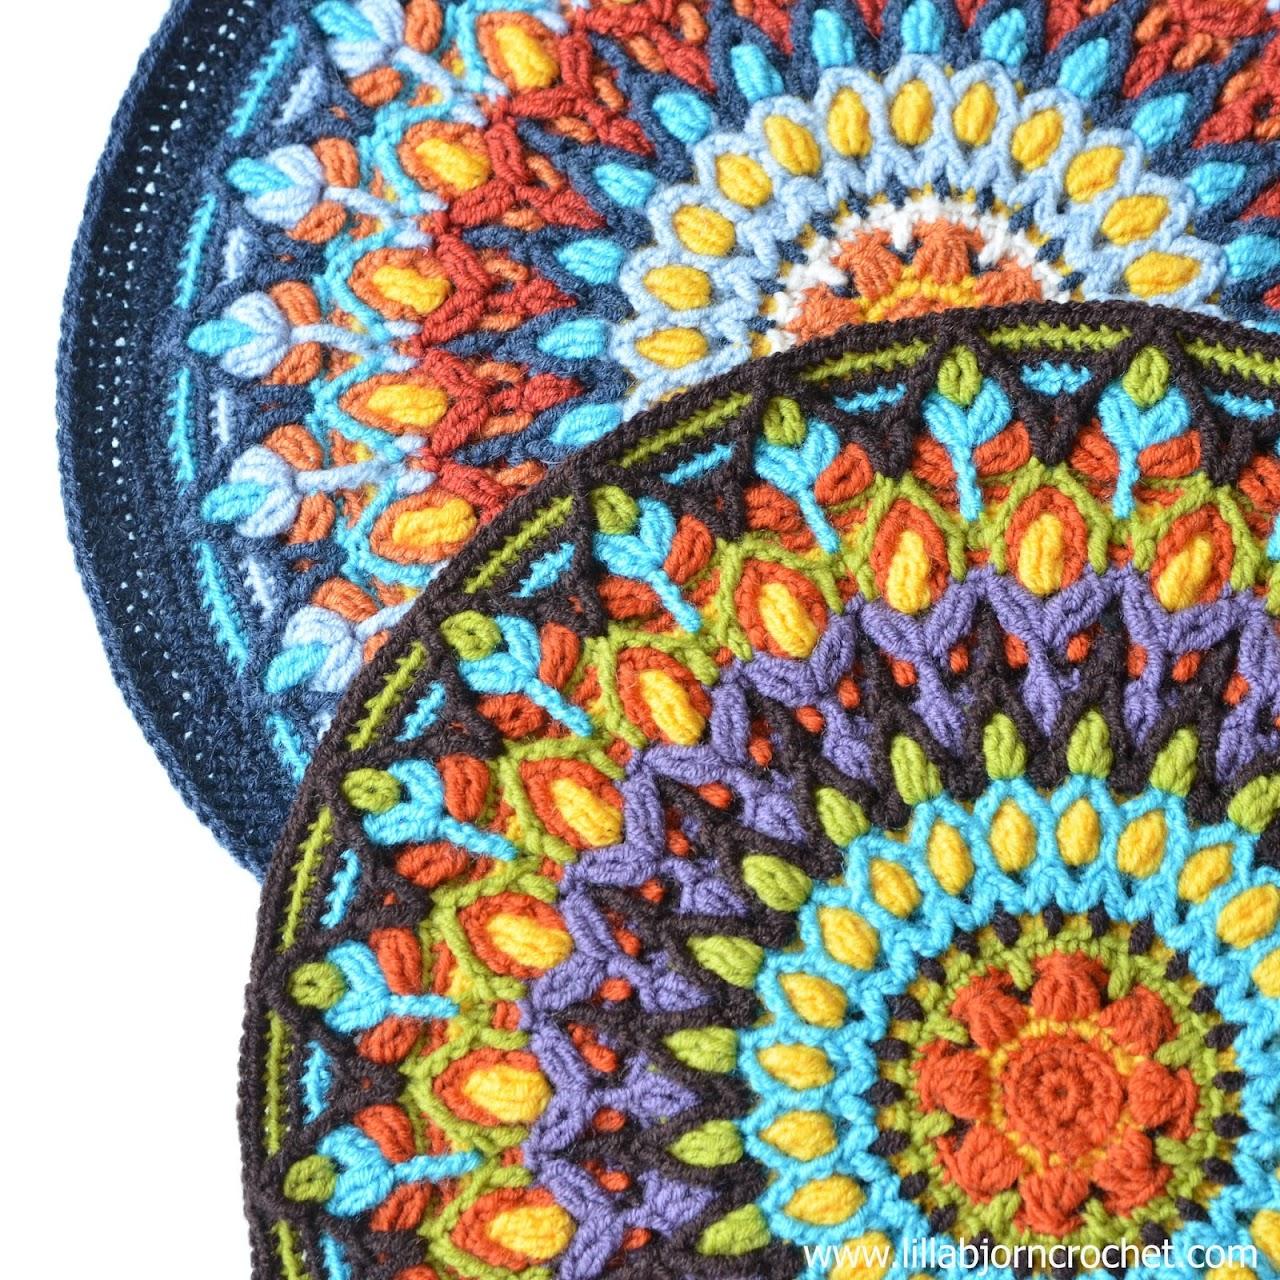 Spanish Mandala. Overlay crochet pattern by Lilla Bjorn Crochet